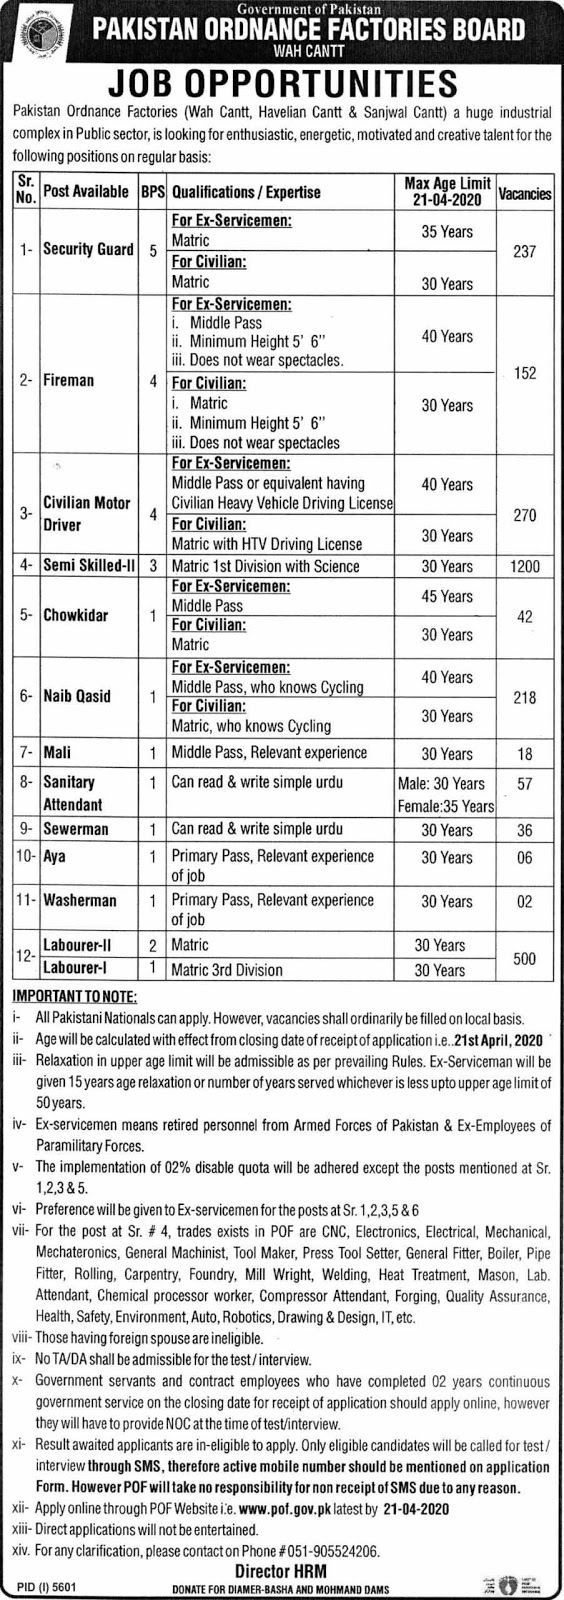 Pakistan Ordinance Factories POF Jobs April 2020